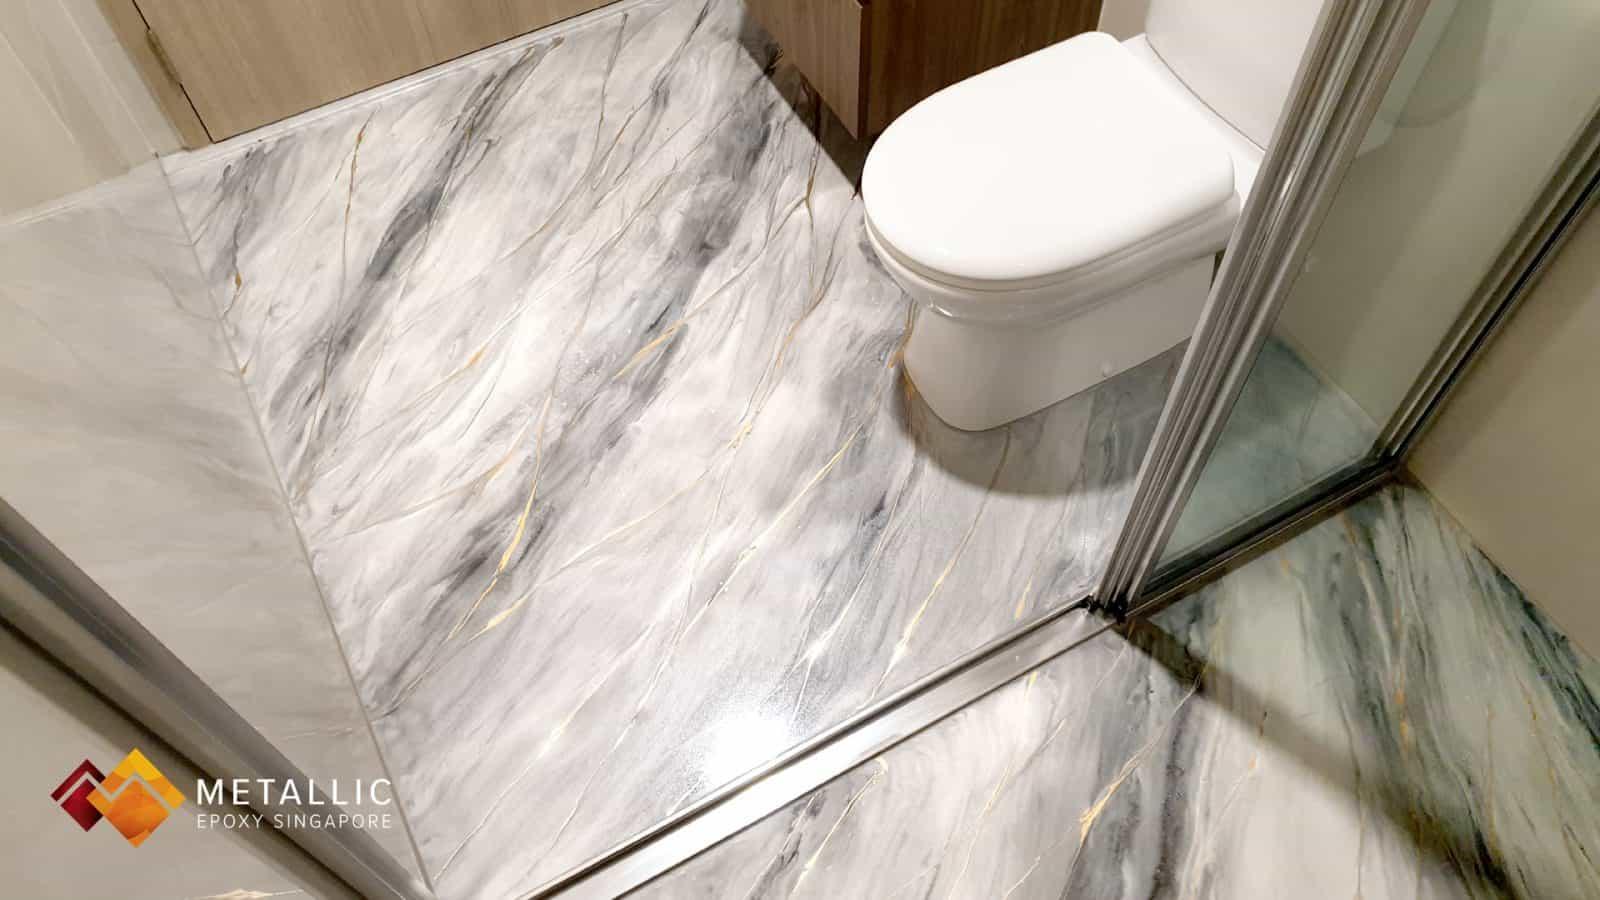 metallic epoxy singapore grey silver gold marble bathroom floor